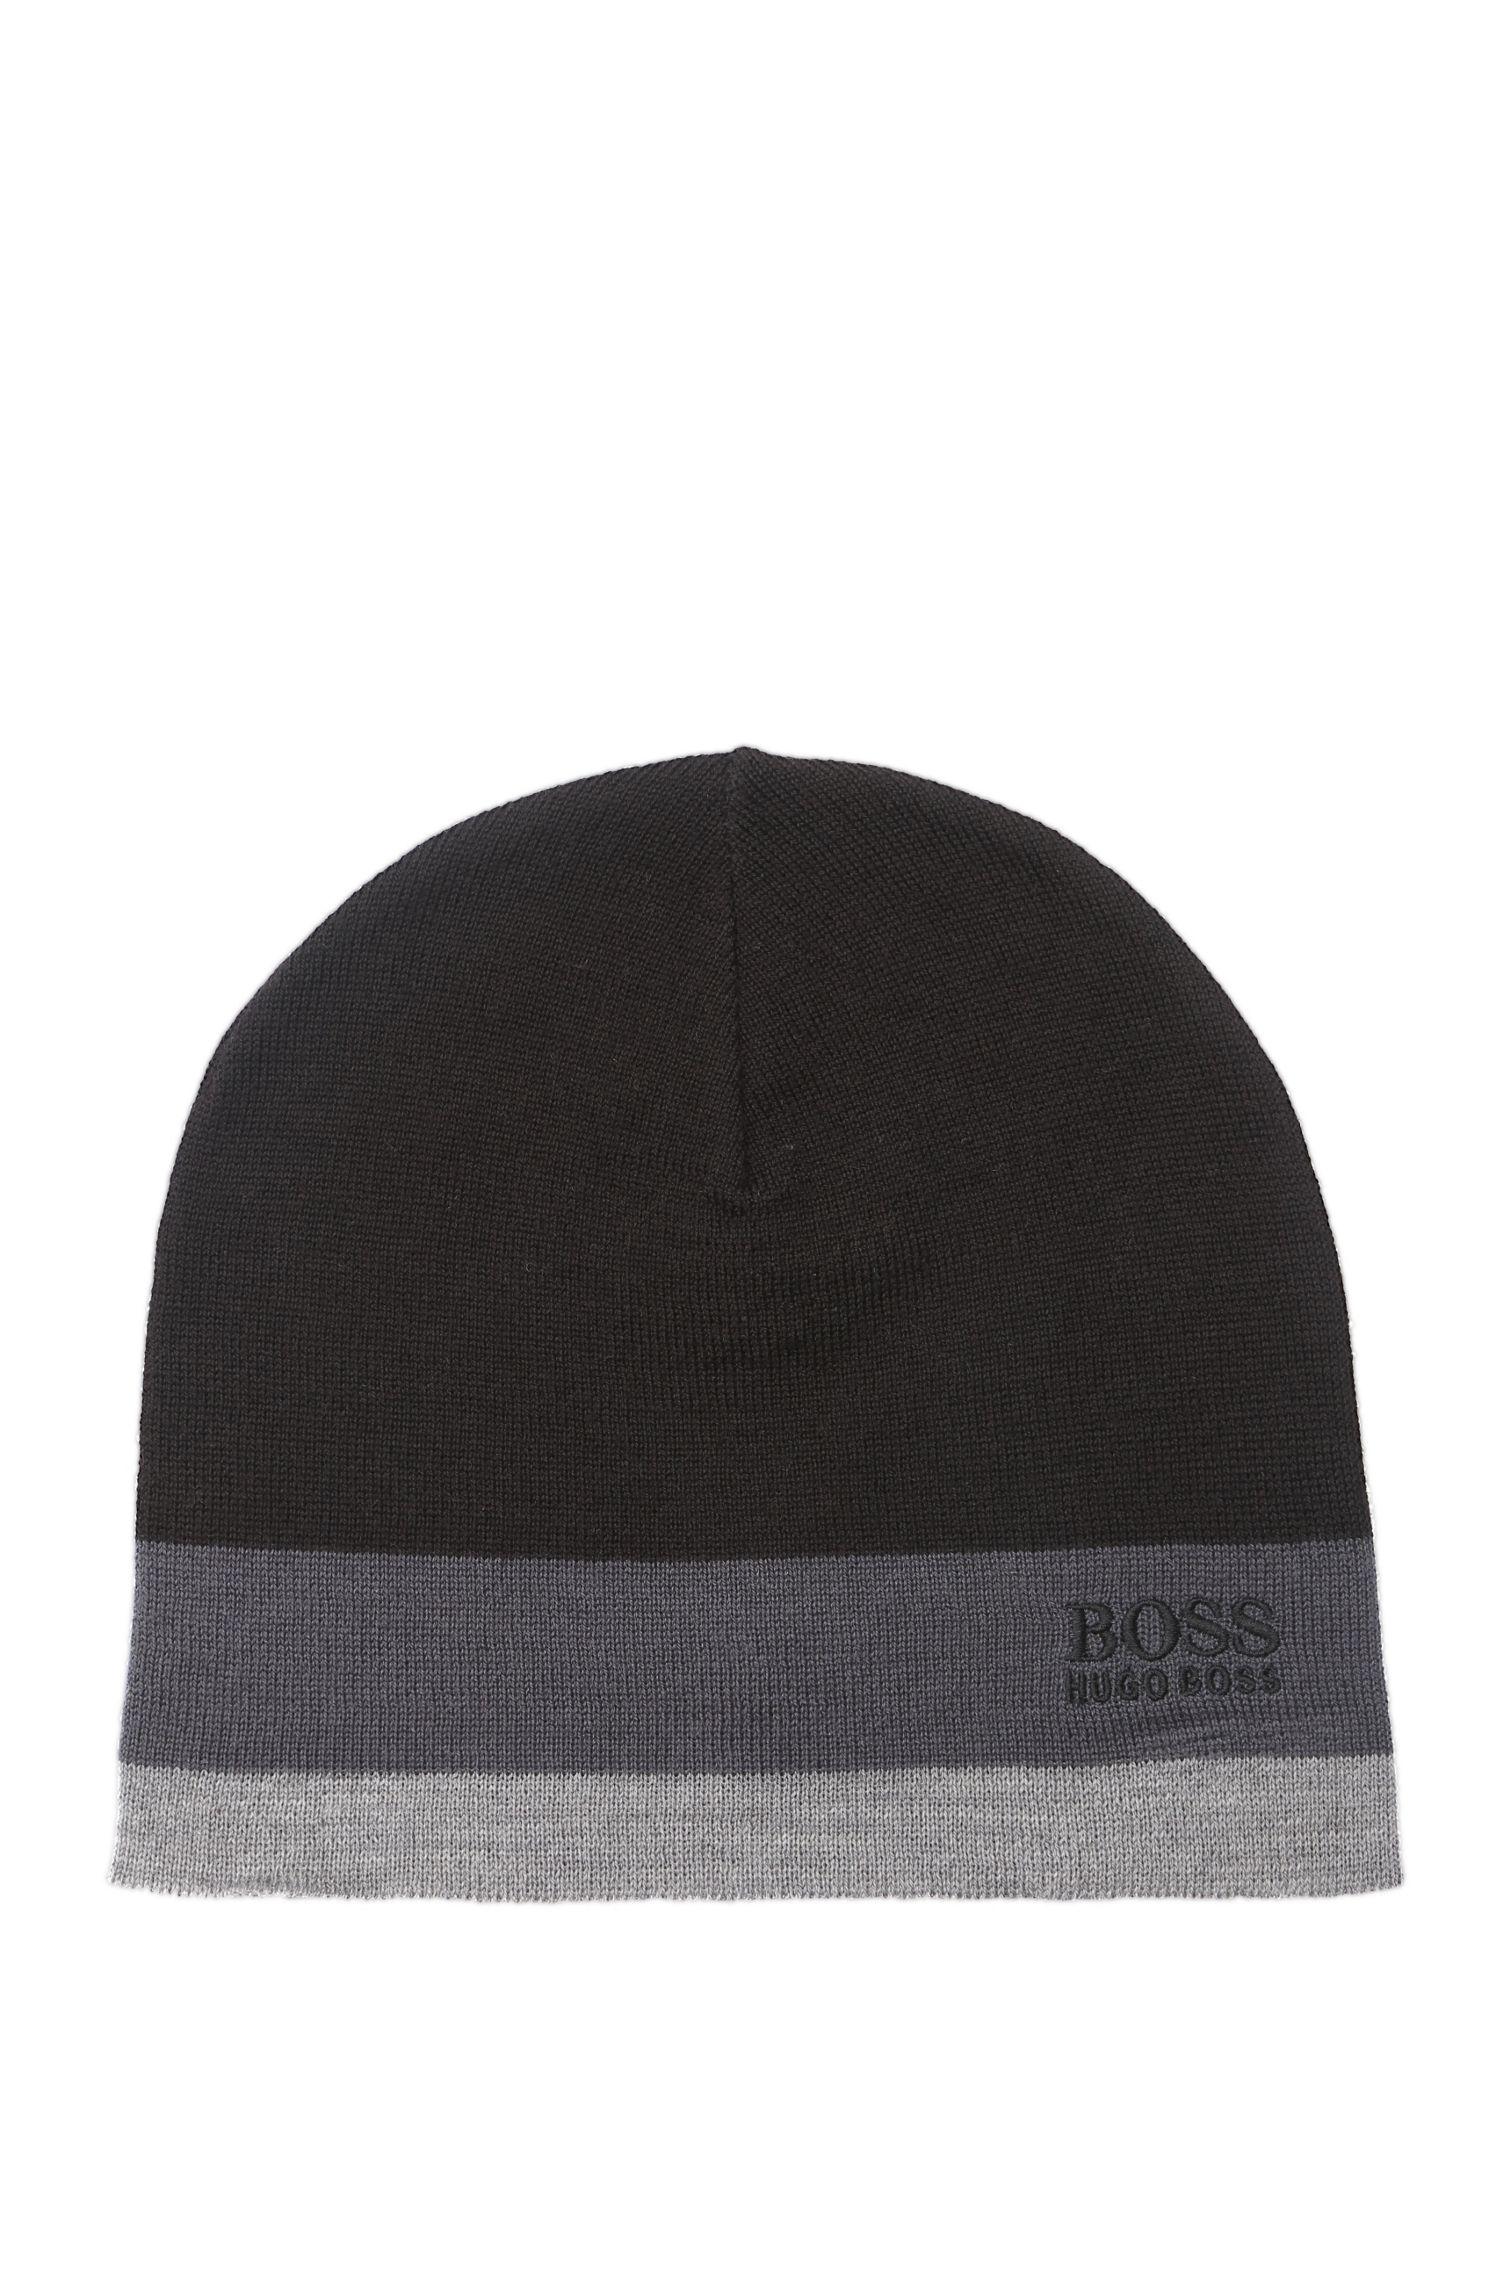 Colourblock beanie hat in wool blend